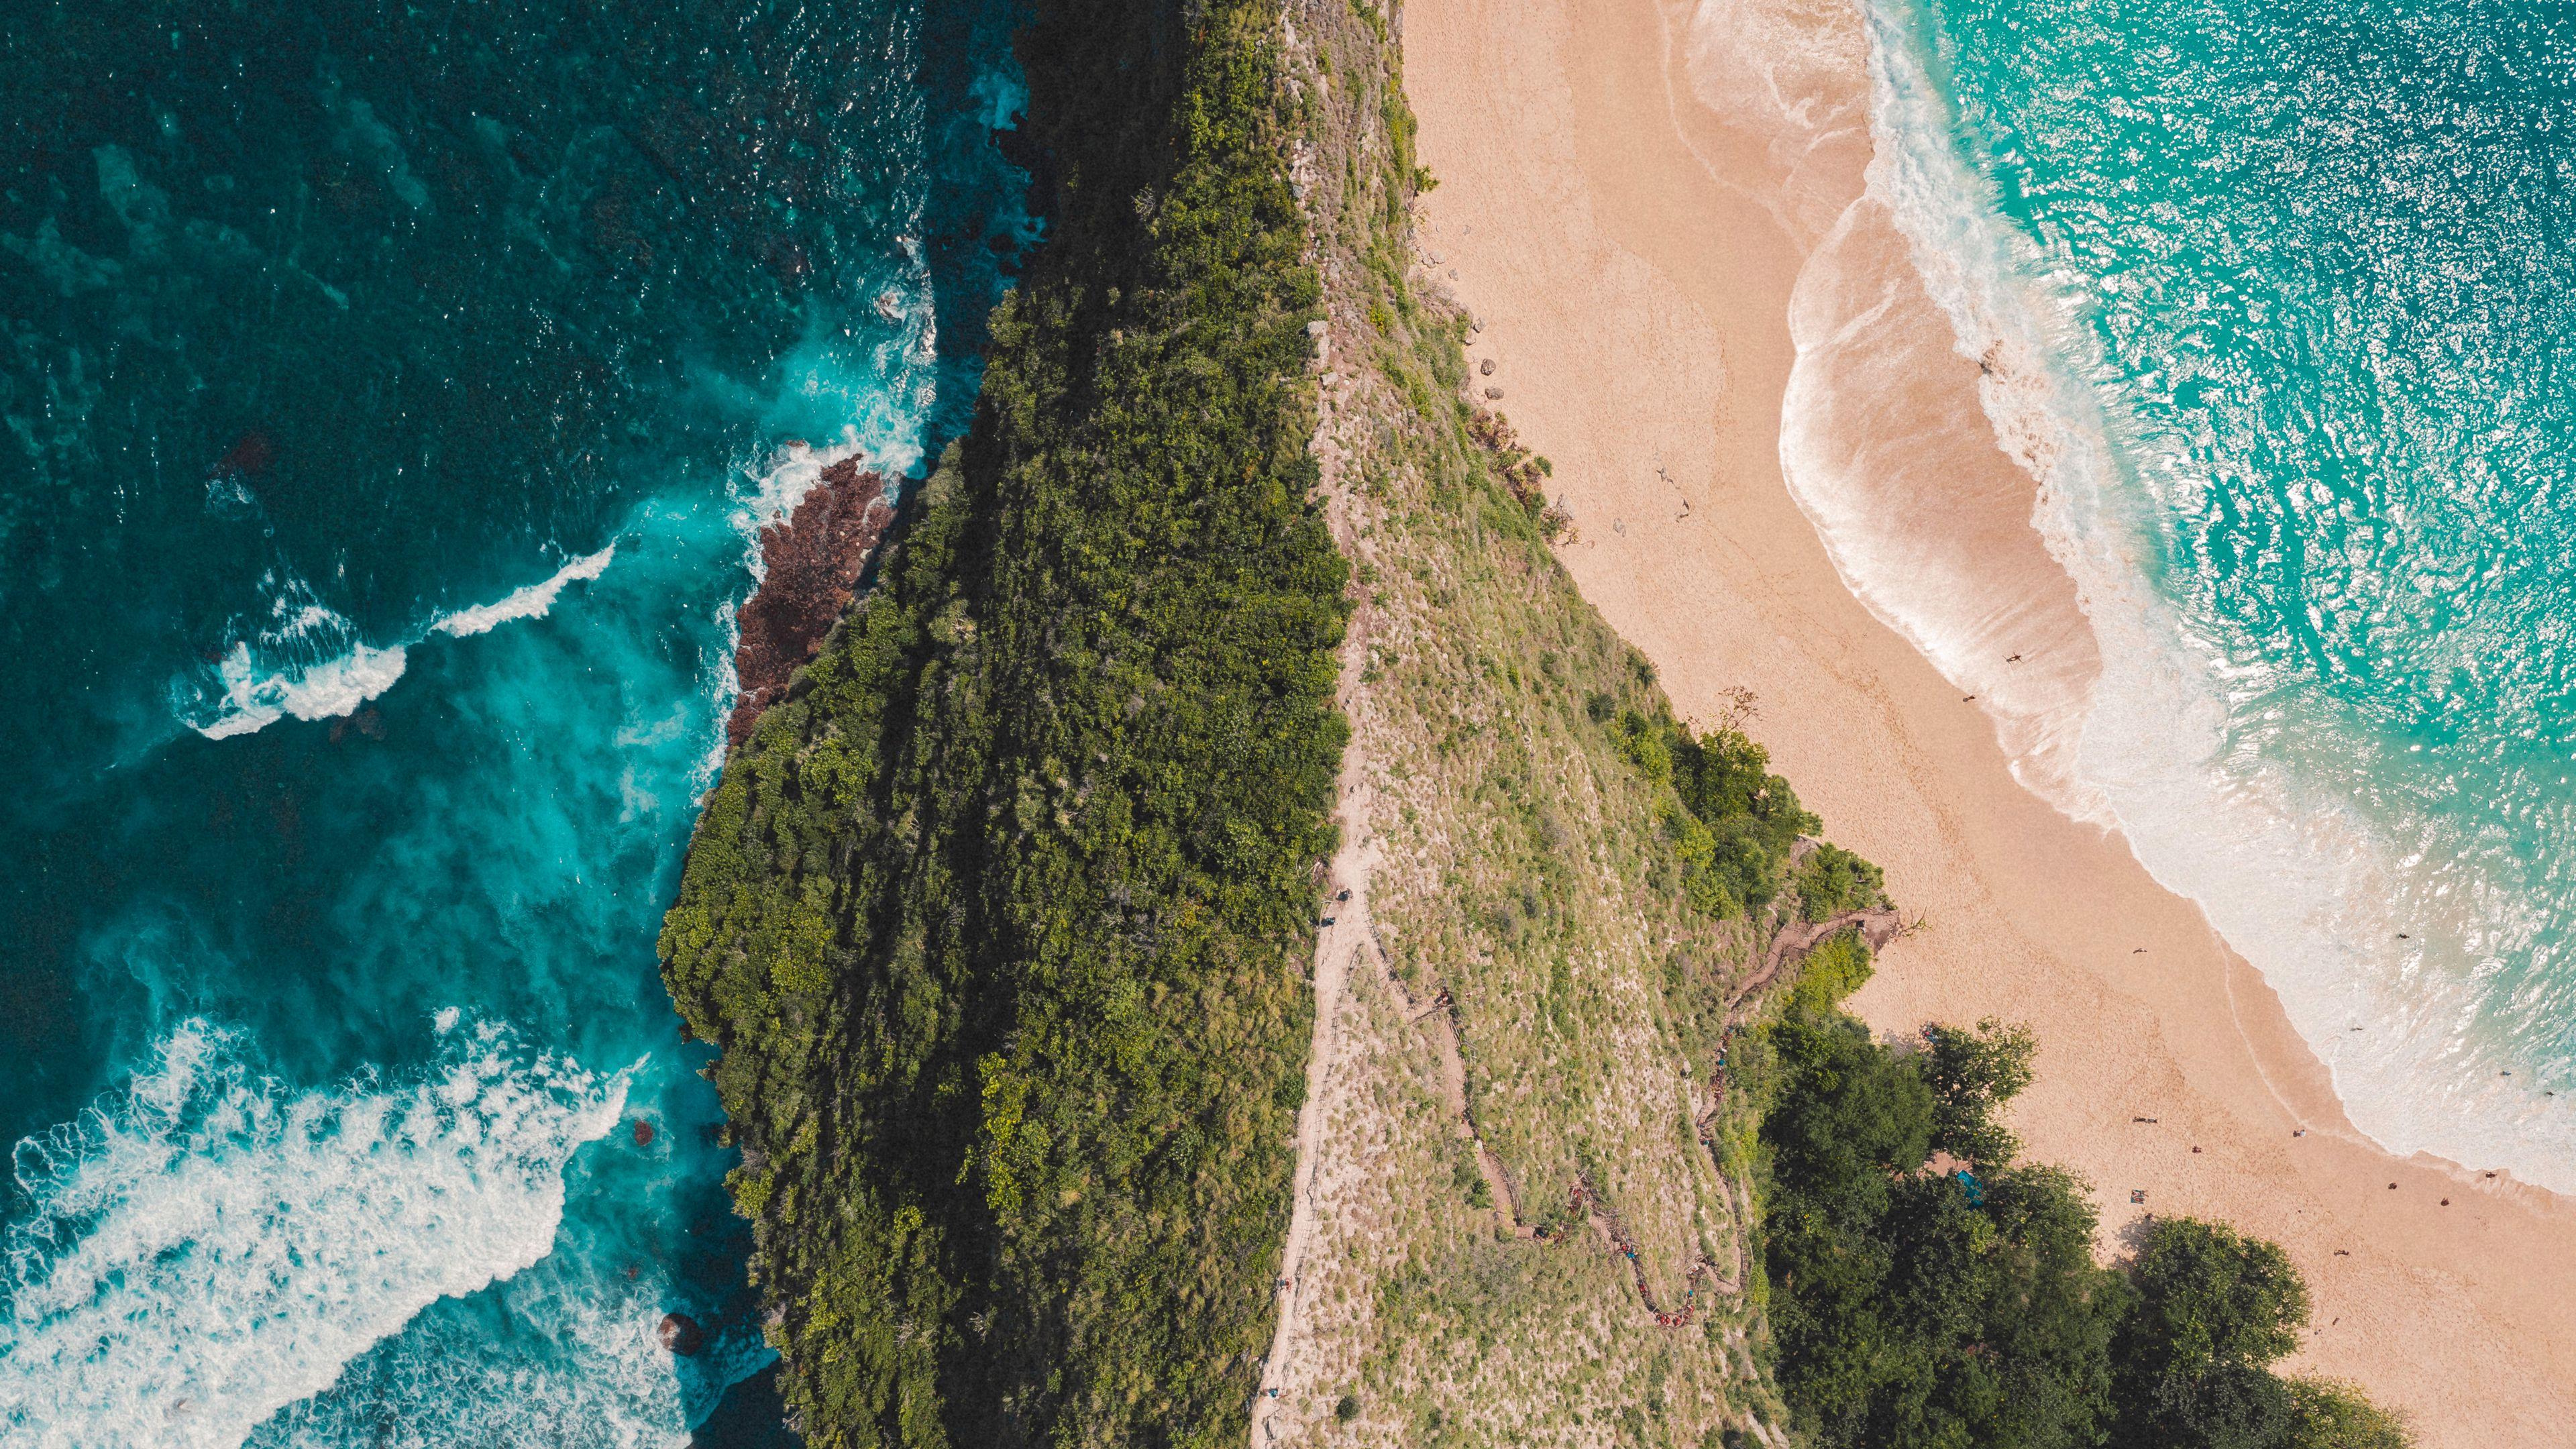 Download wallpaper 3840x2160 ocean island aerial view surf 3840x2160